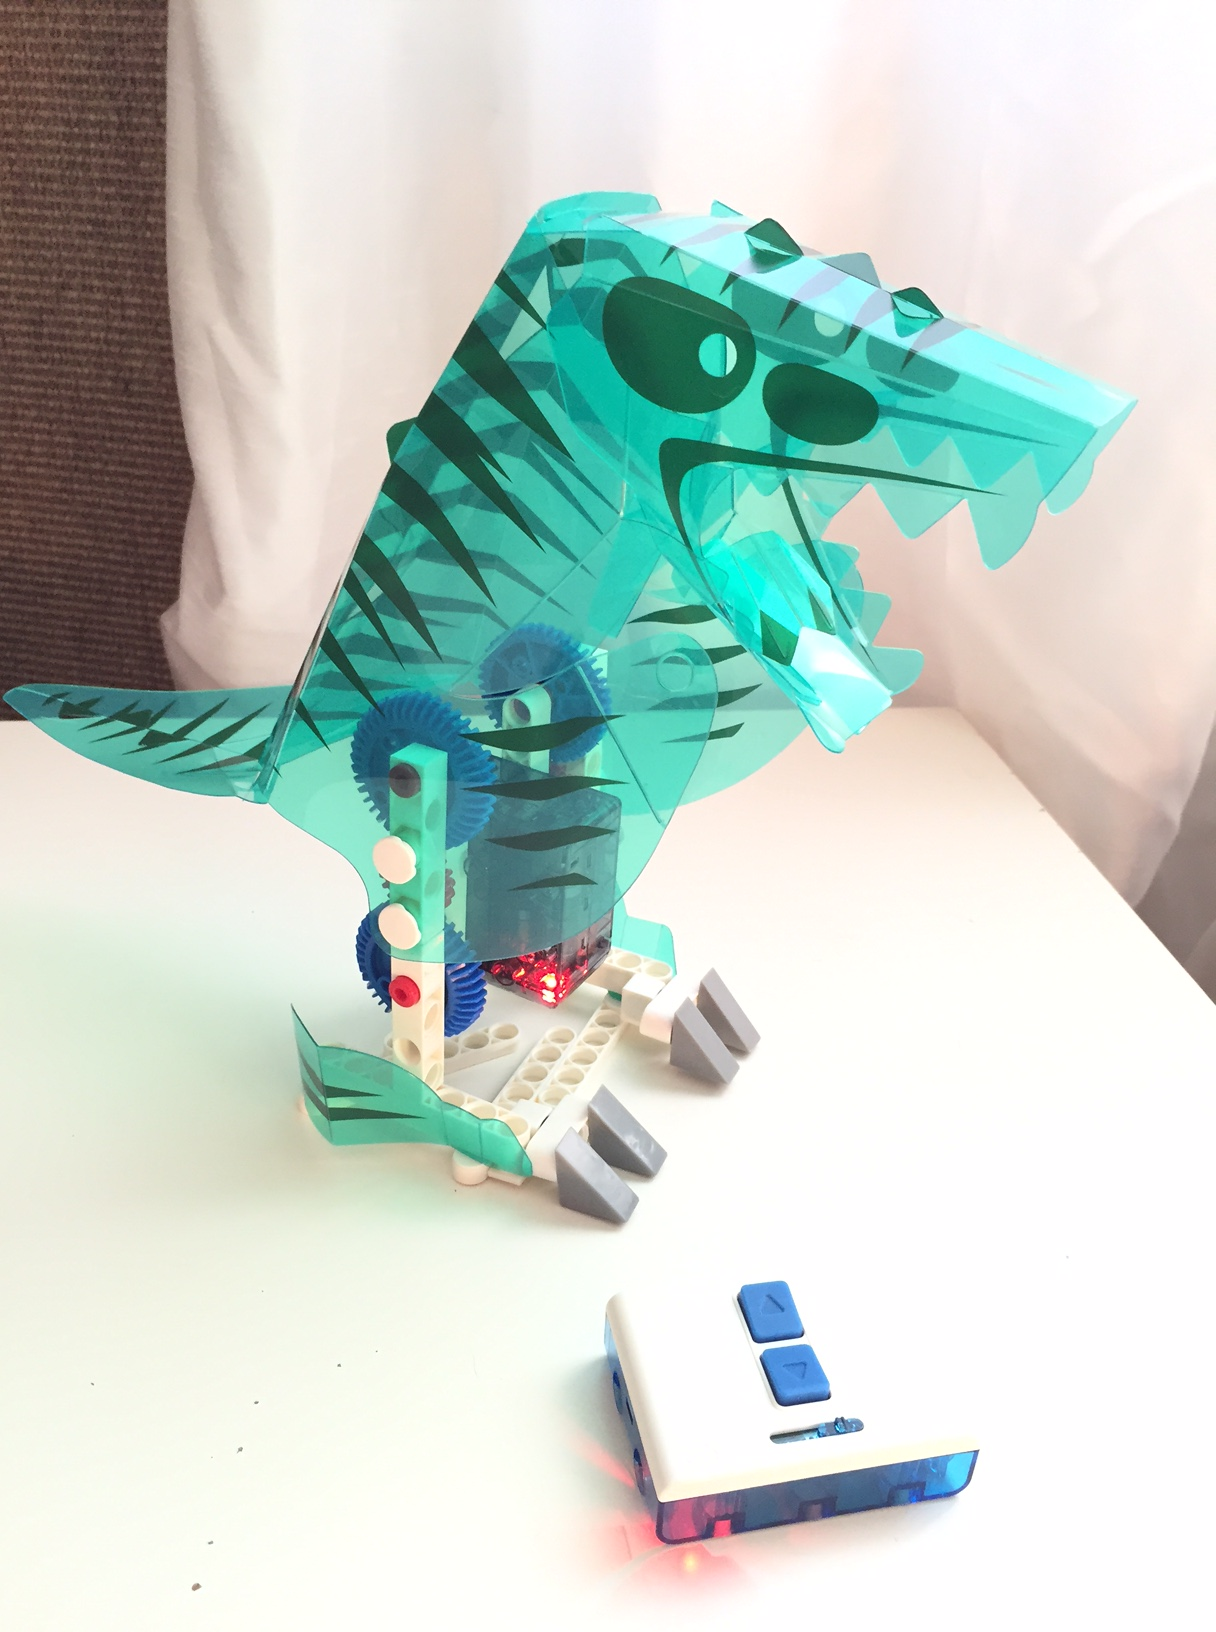 Animaux Télécommandés Buki : King Jouet, Lego, planchettes & autres Buki